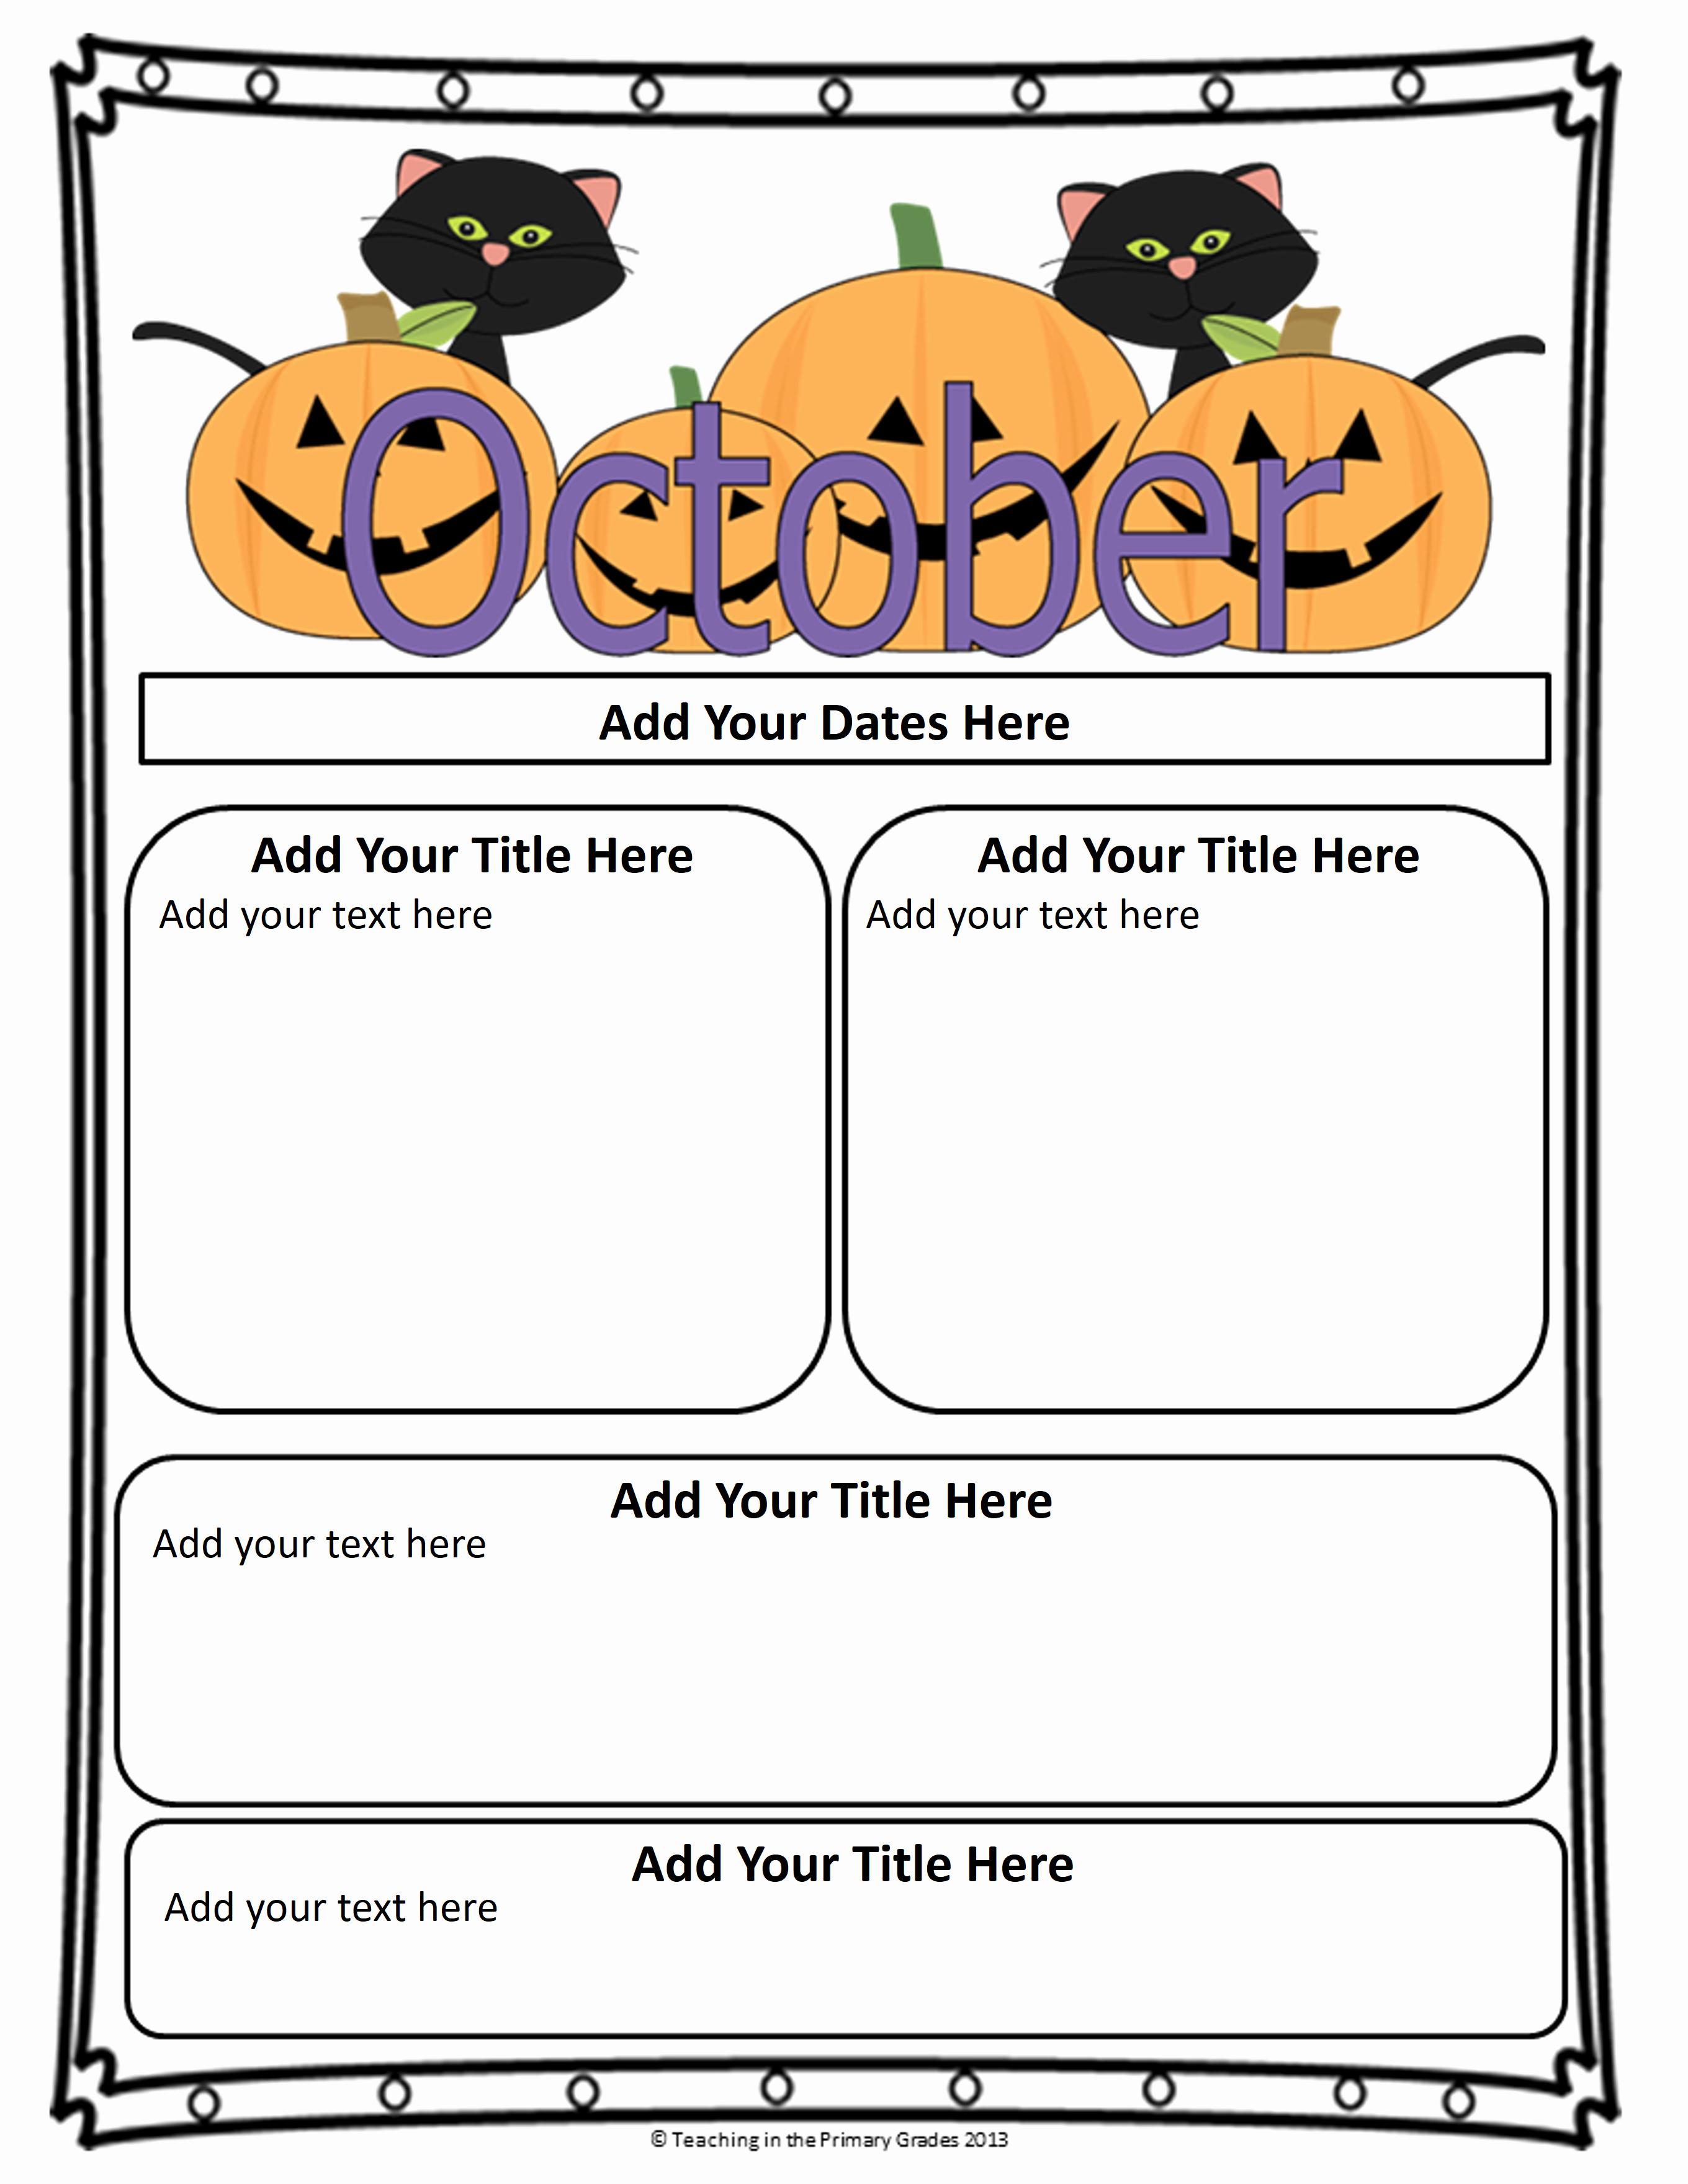 Free October Newsletter Template Elegant Classroom Newsletter Templates